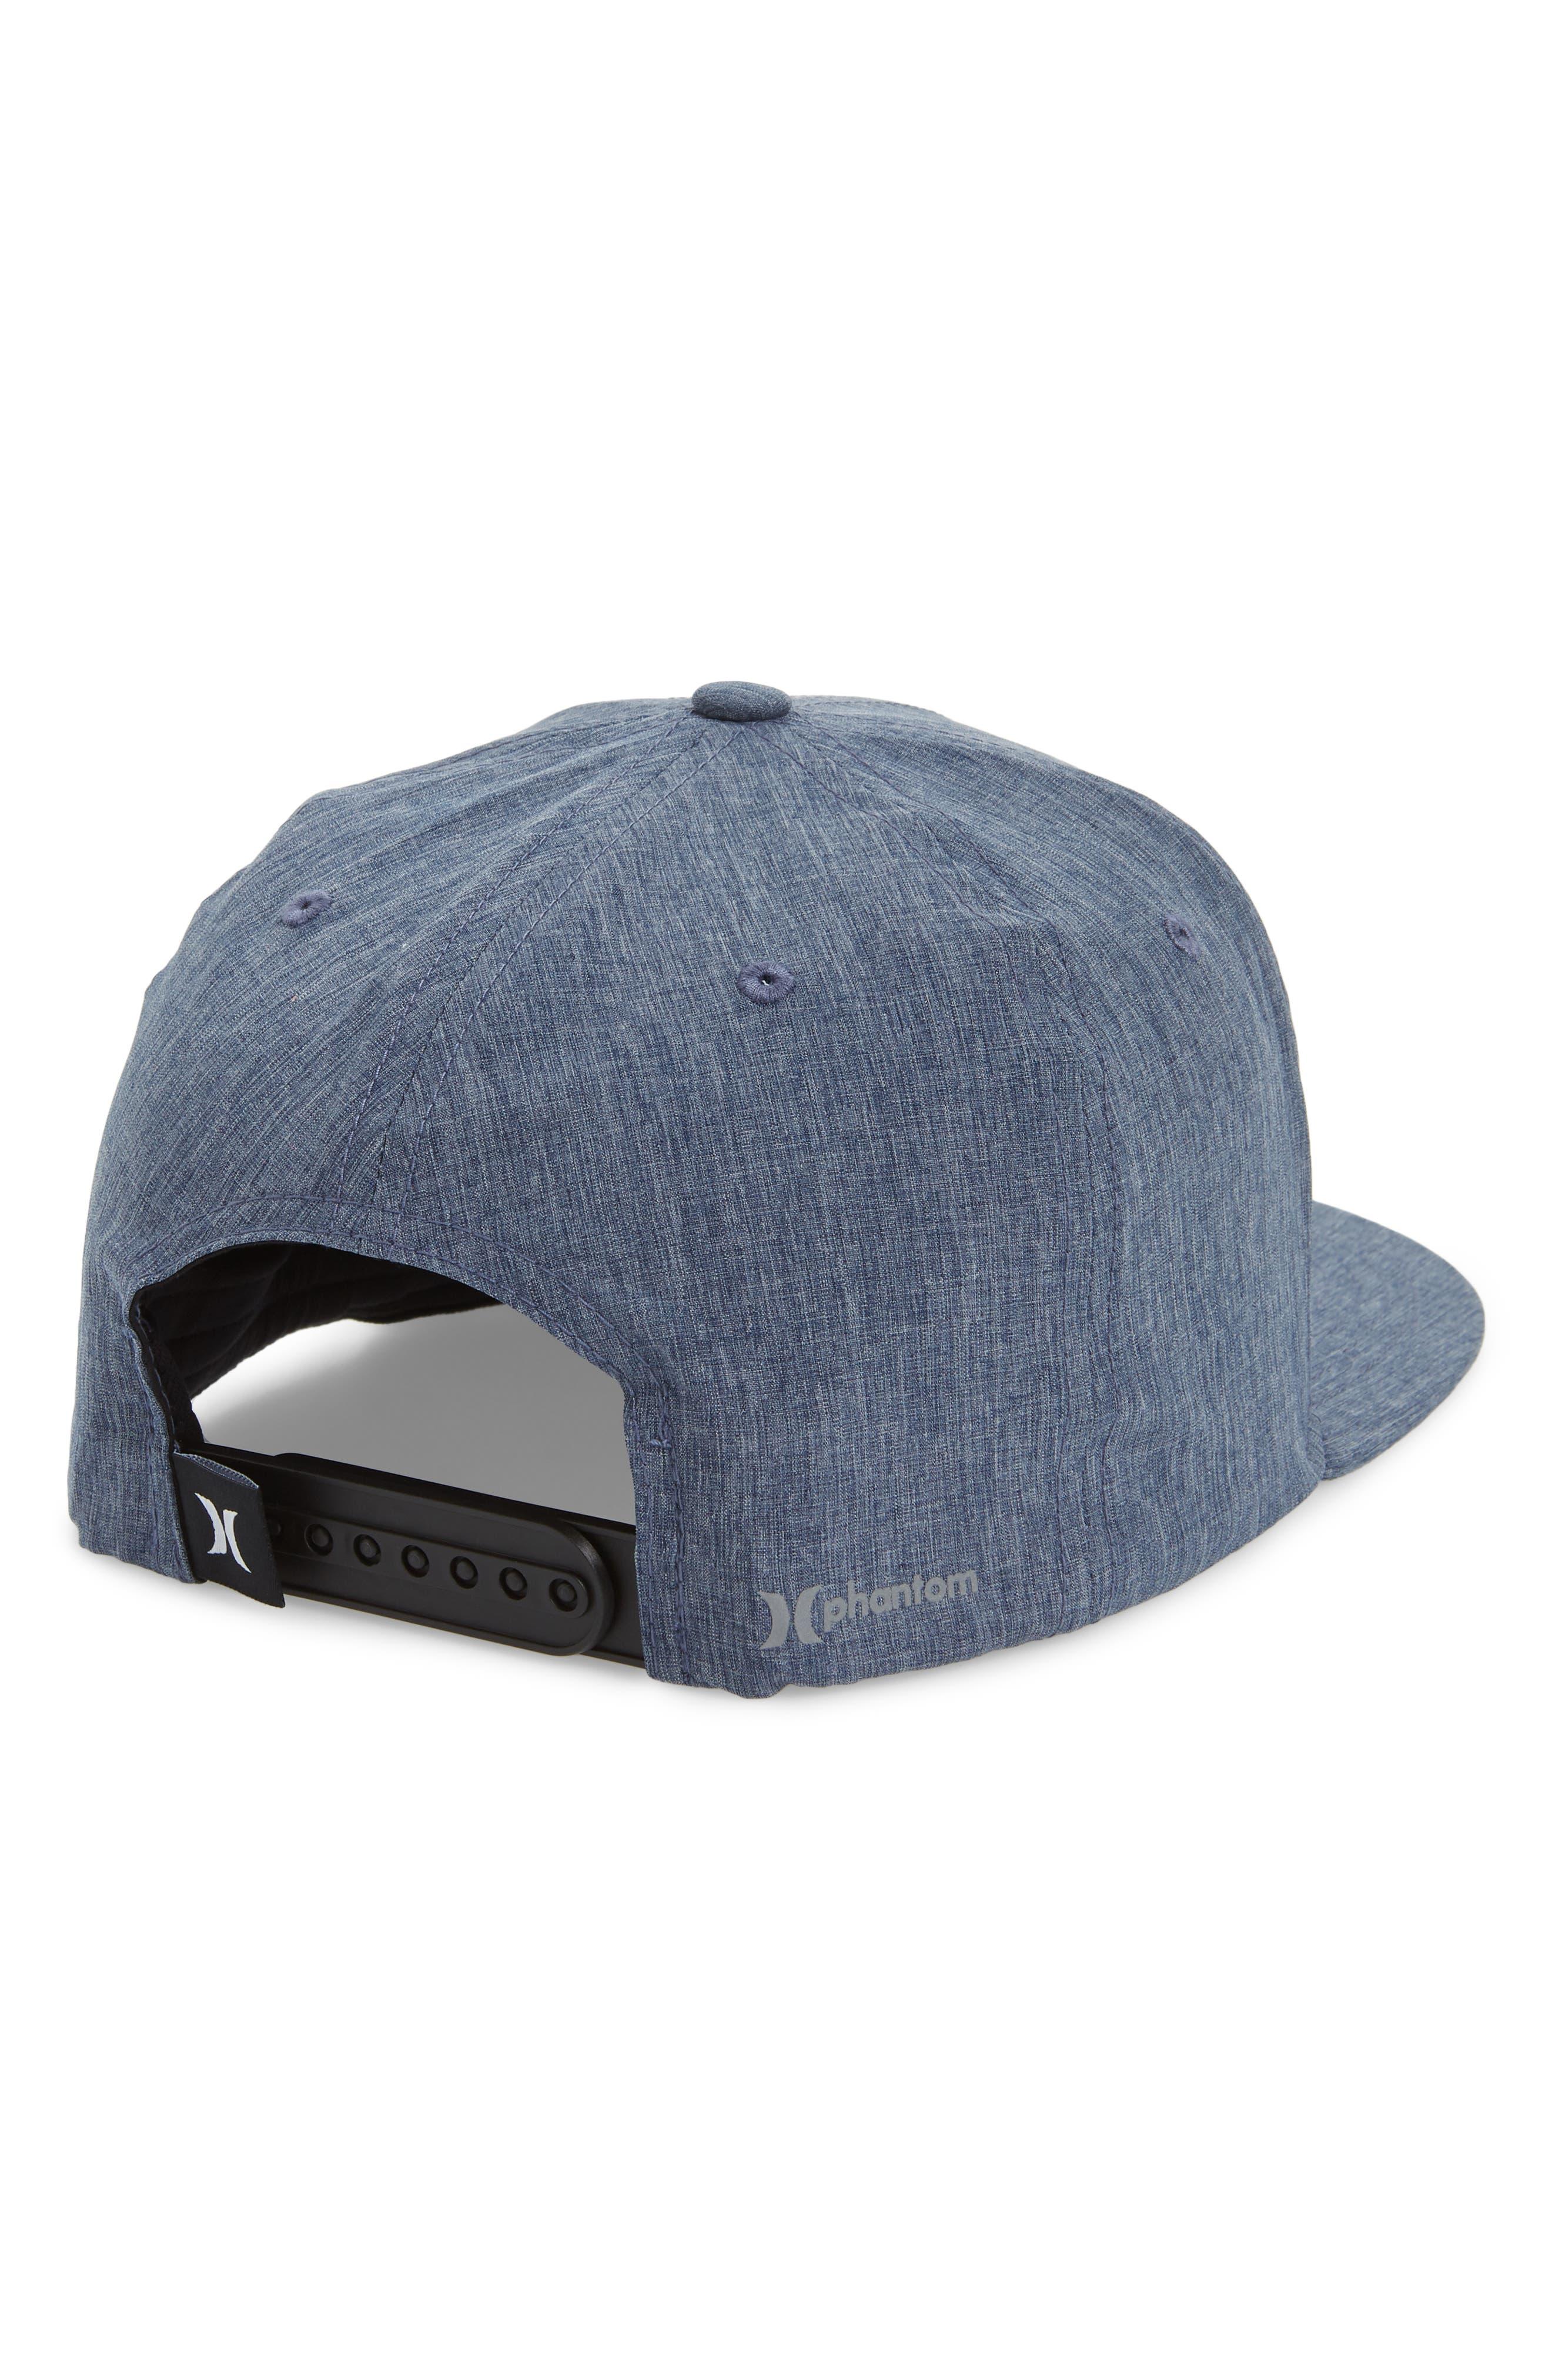 Phantom Corp Hat,                             Alternate thumbnail 2, color,                             Obsidian / Black